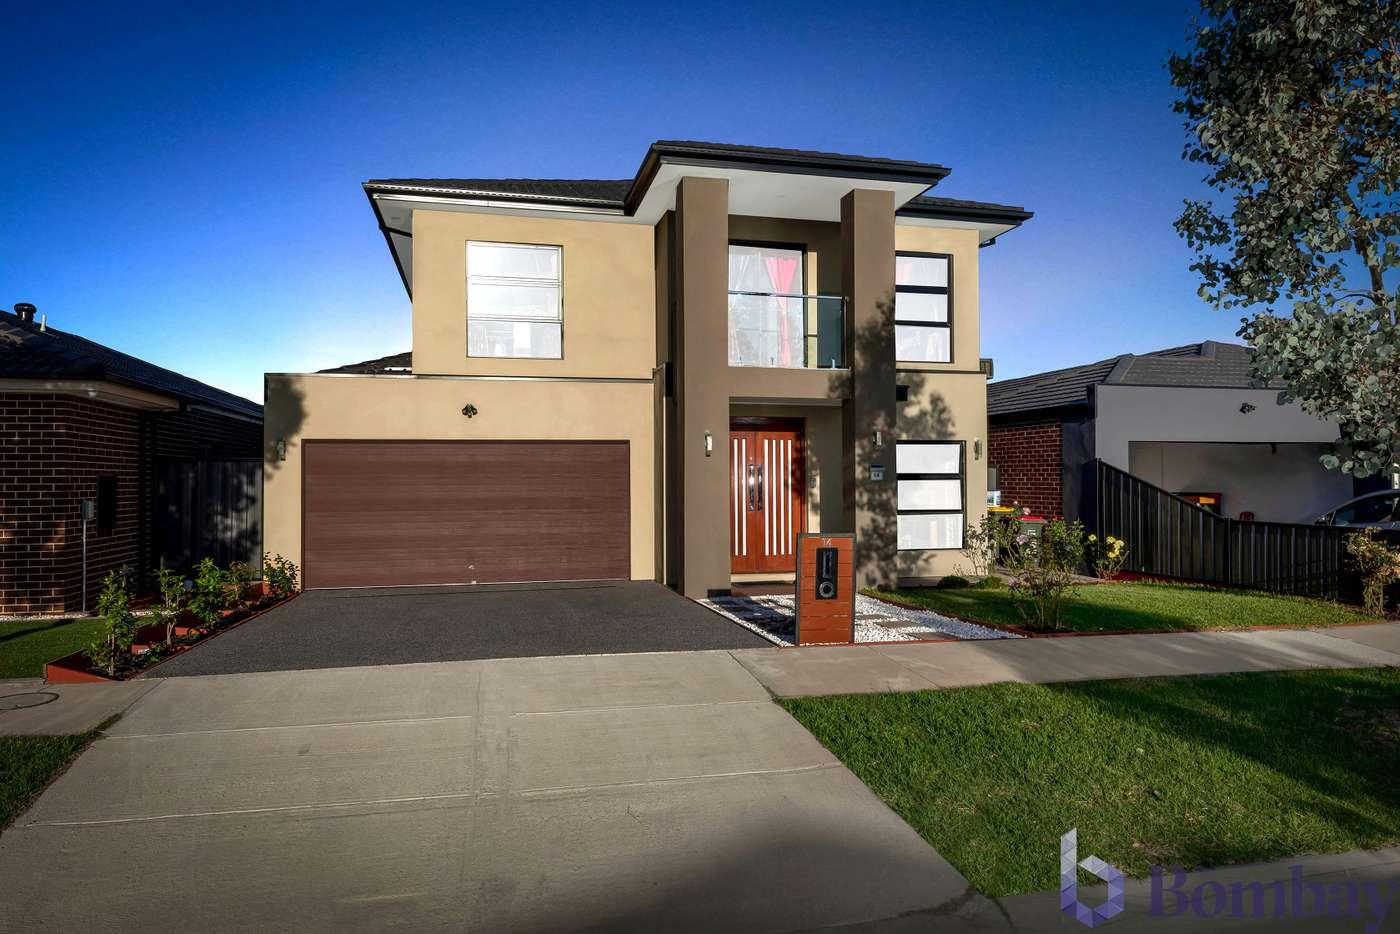 Main view of Homely house listing, 14 Mangrove Way, Craigieburn VIC 3064